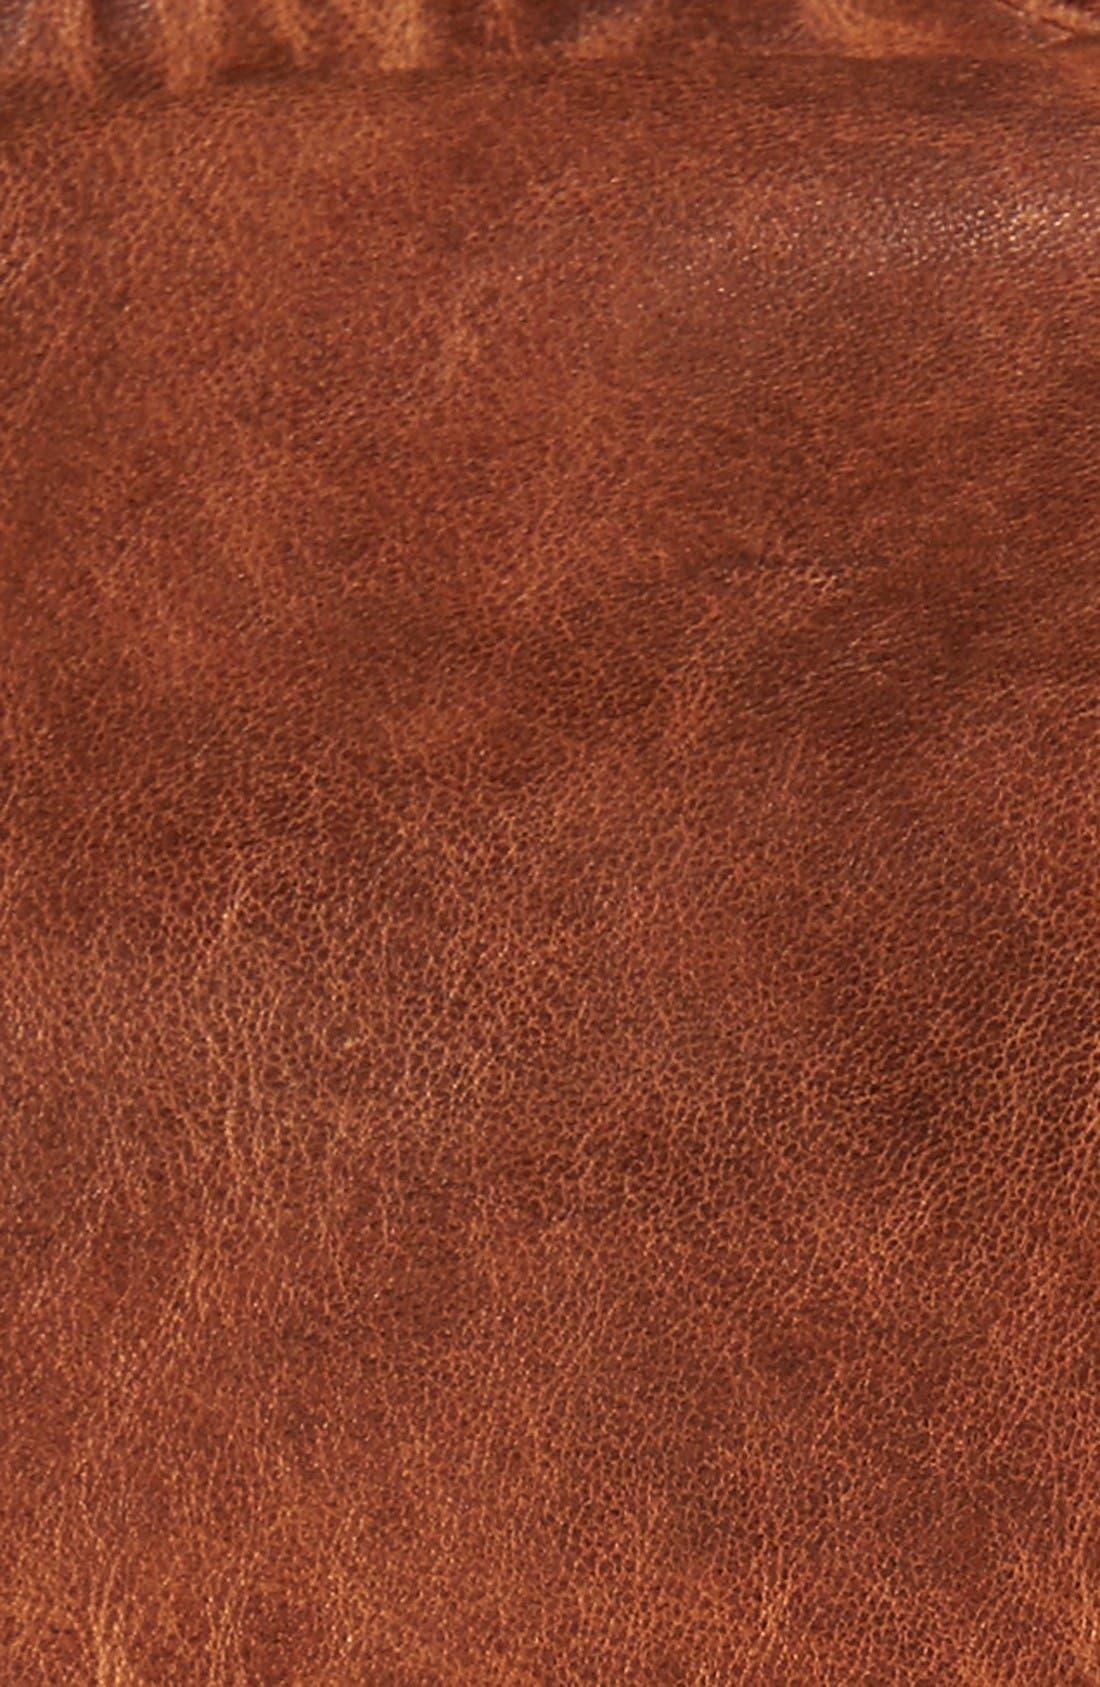 Washed Lamb Leather Jacket,                             Alternate thumbnail 5, color,                             Cognac